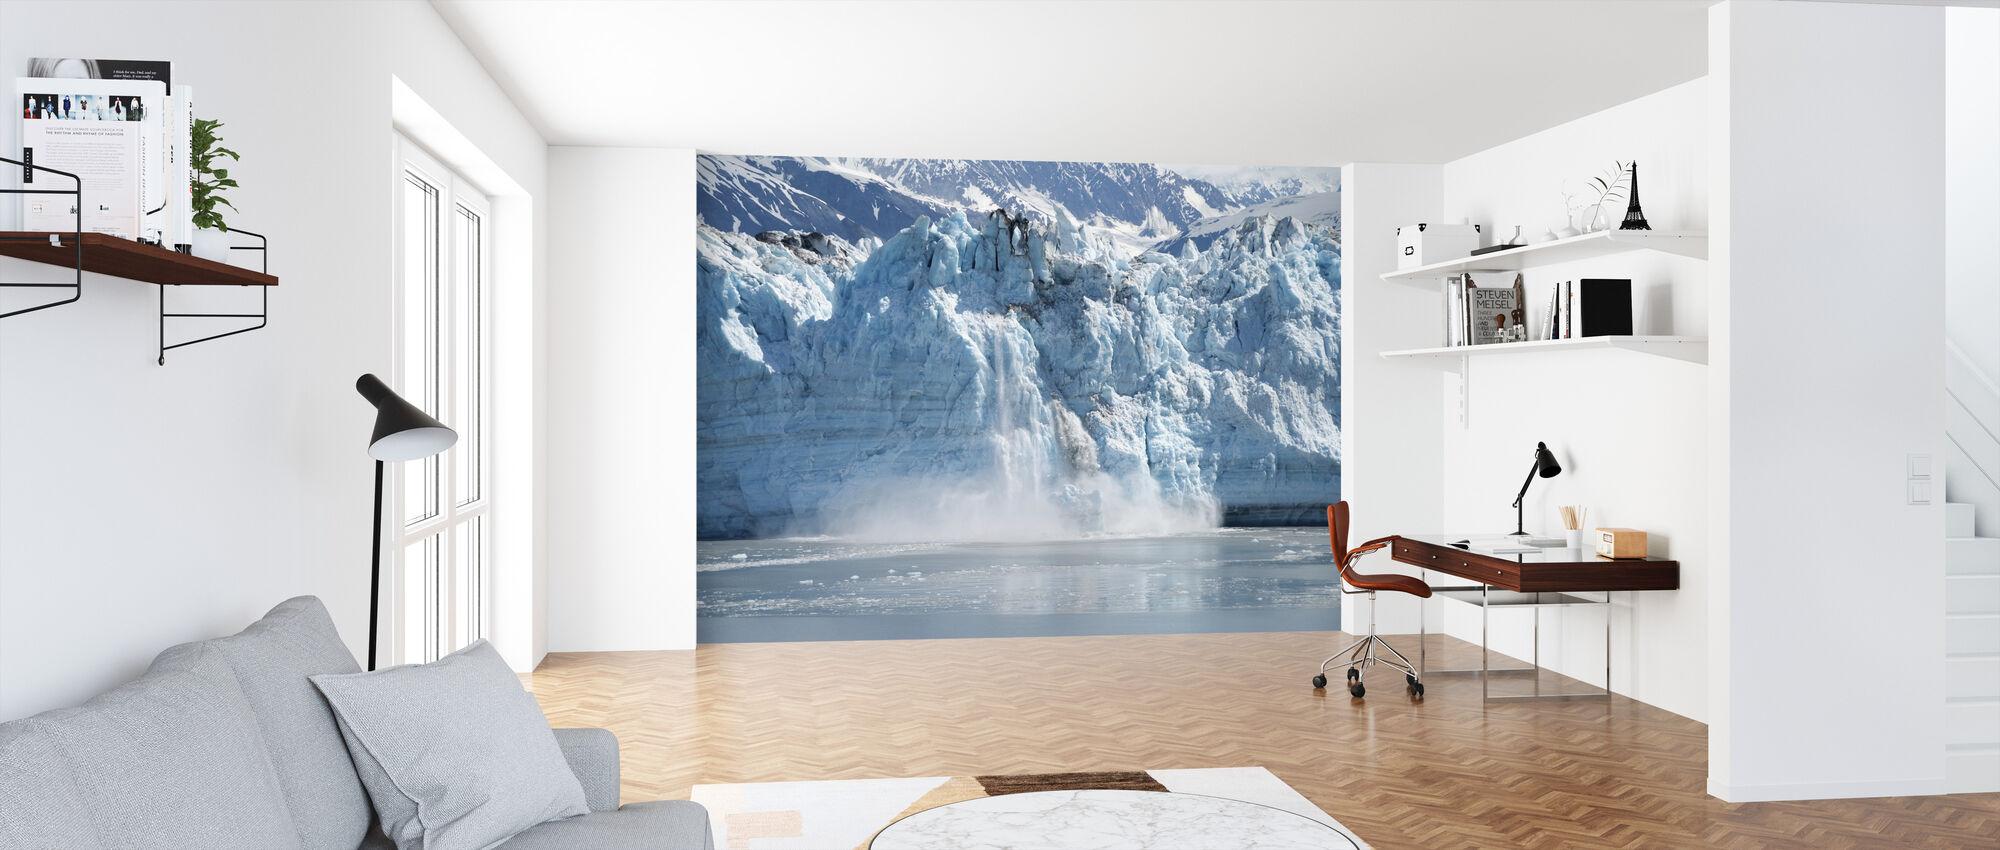 Gletsjer kalveren - Behang - Kantoor